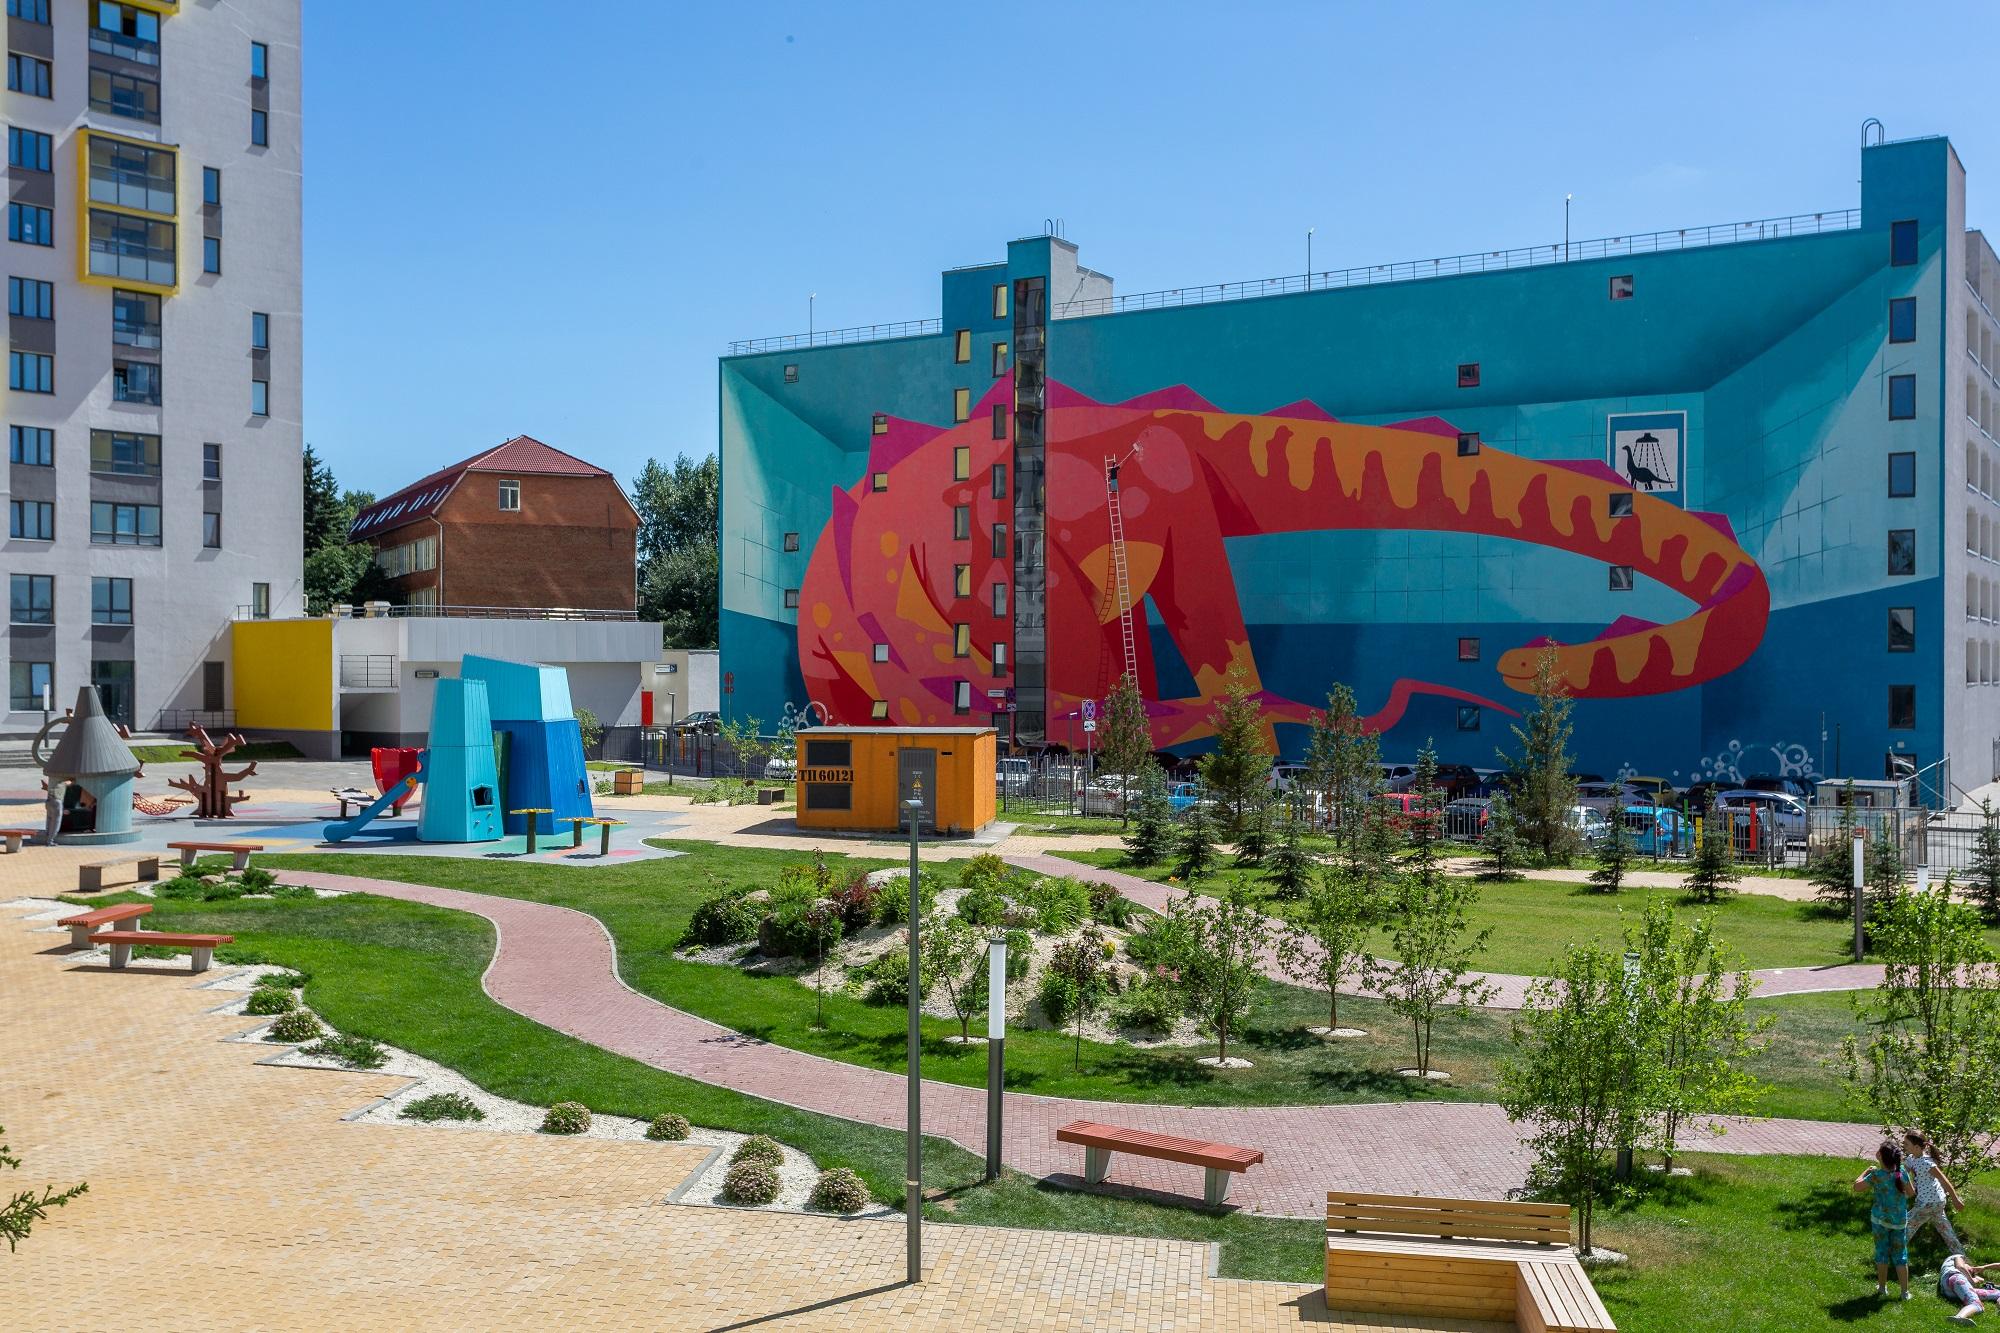 Прямо во дворе «Малевича» моют динозавра